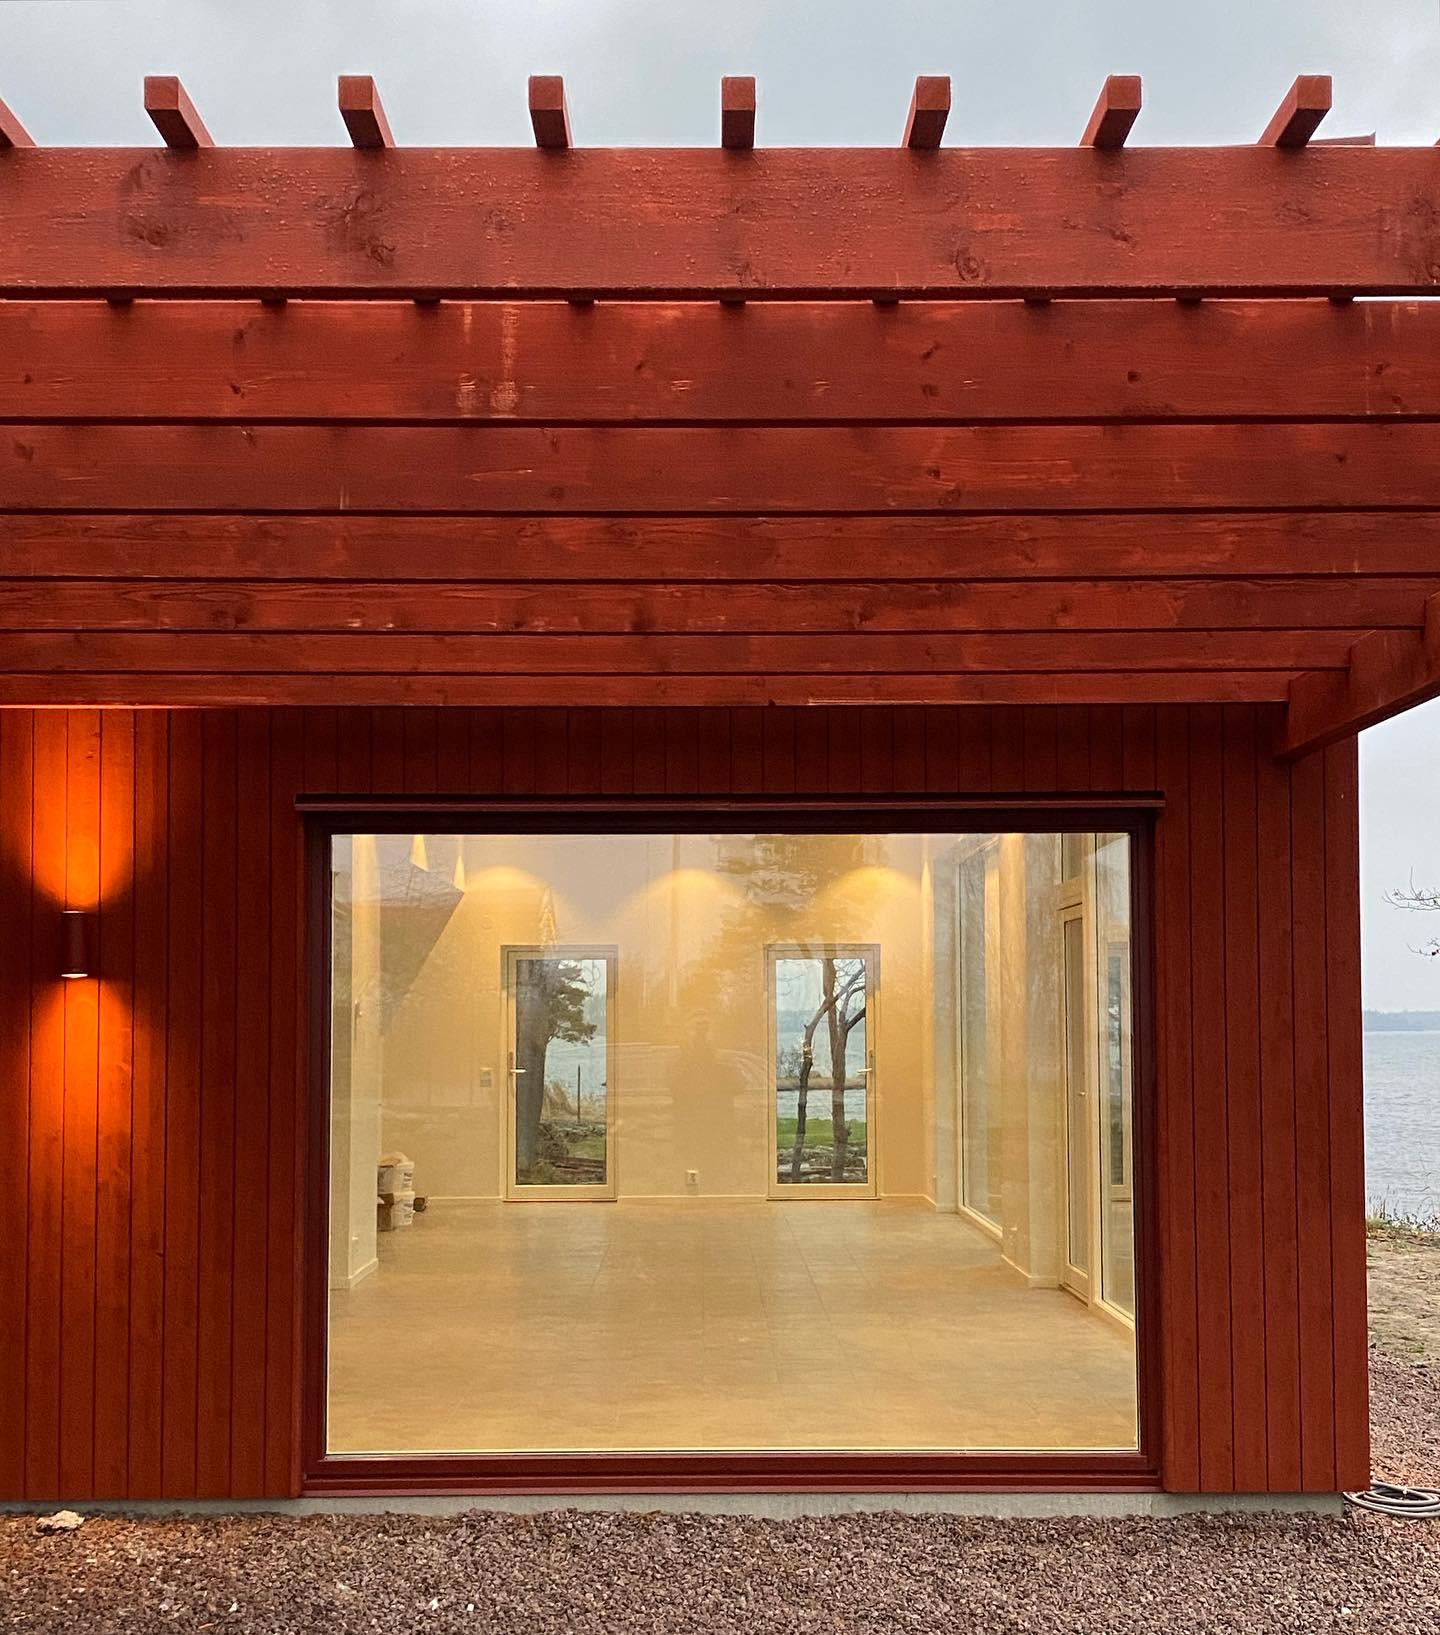 Arkitektritat fritidshus i faluröd